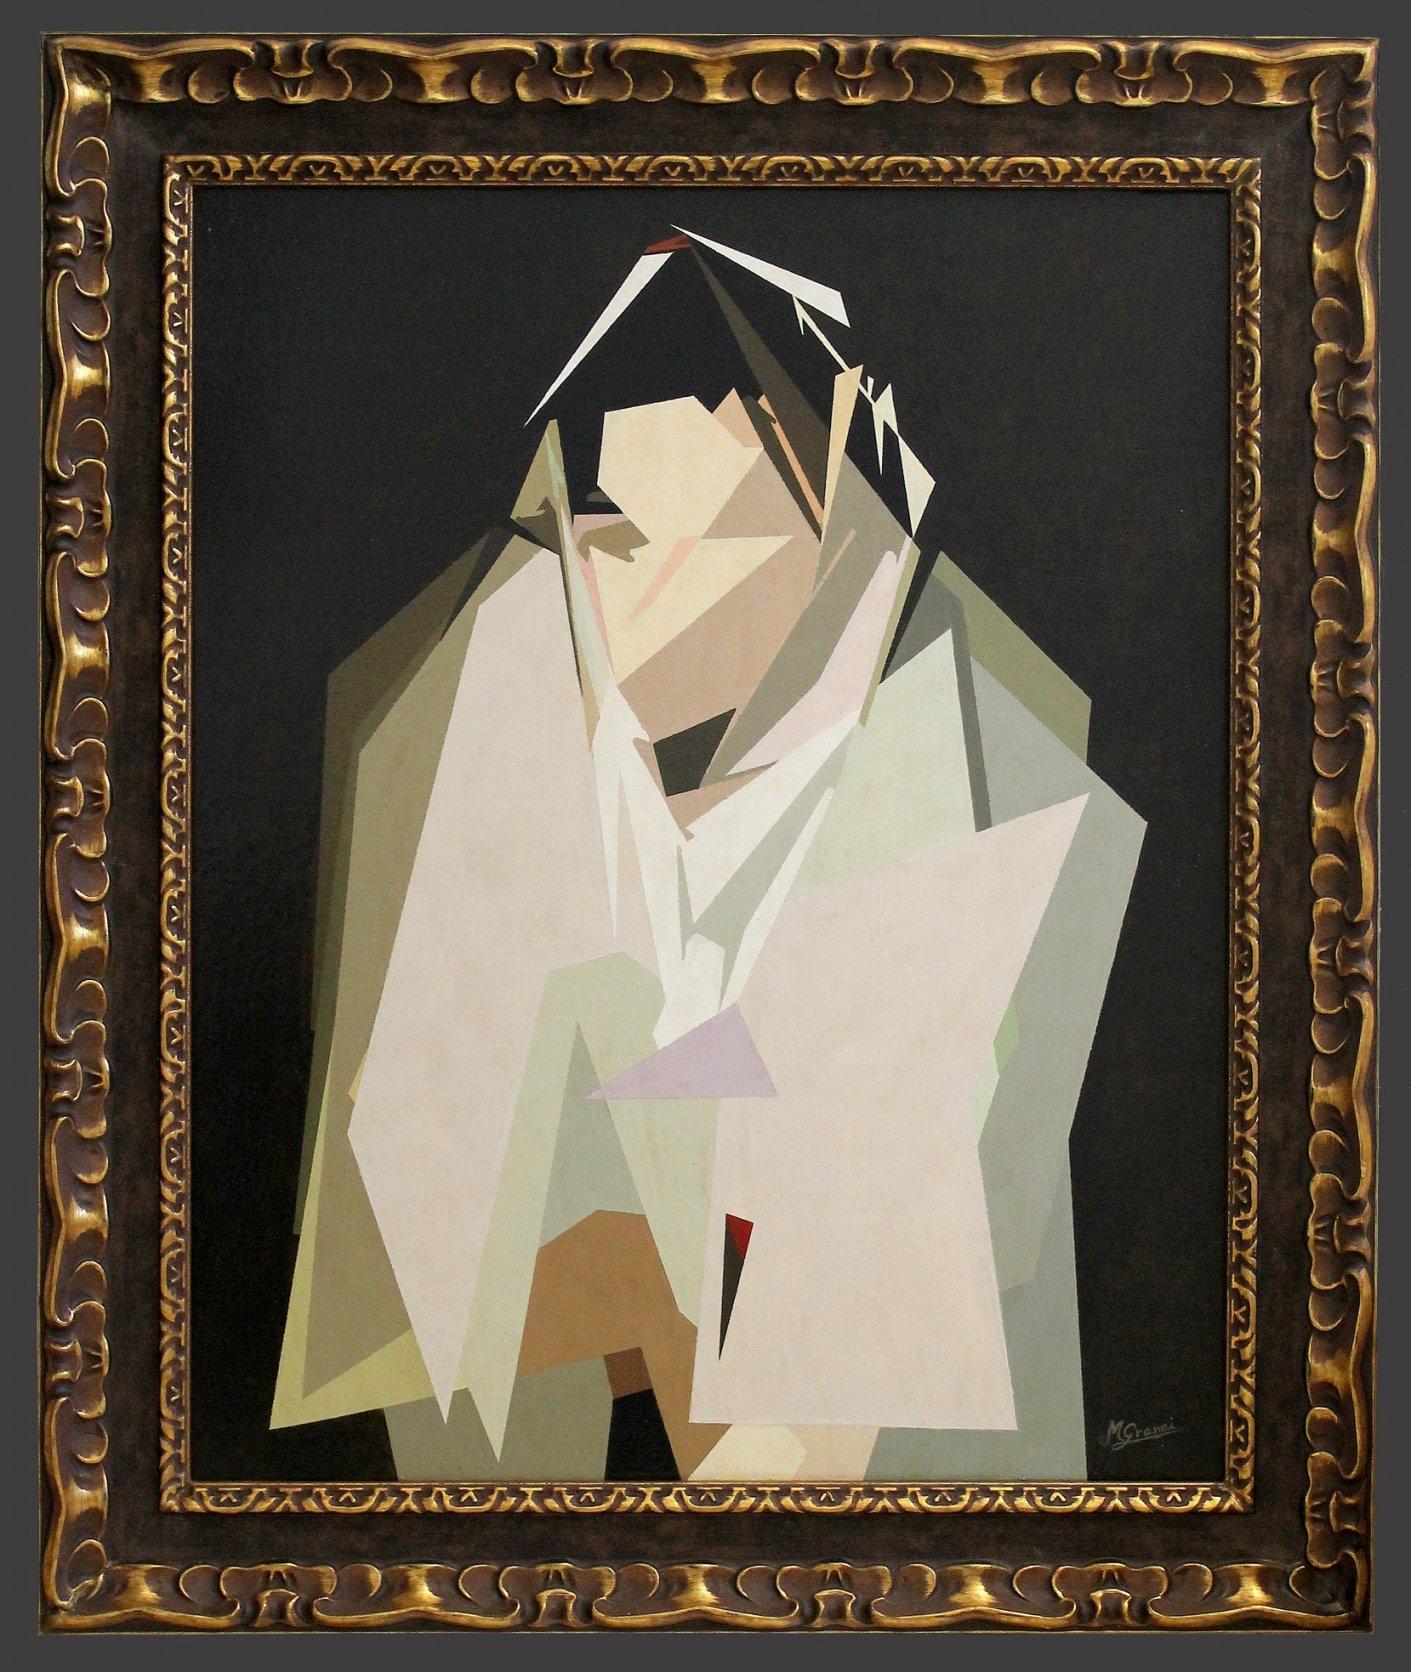 Lady With An Ermine (2019) - Manuel Granai Luna - Manuel Granai